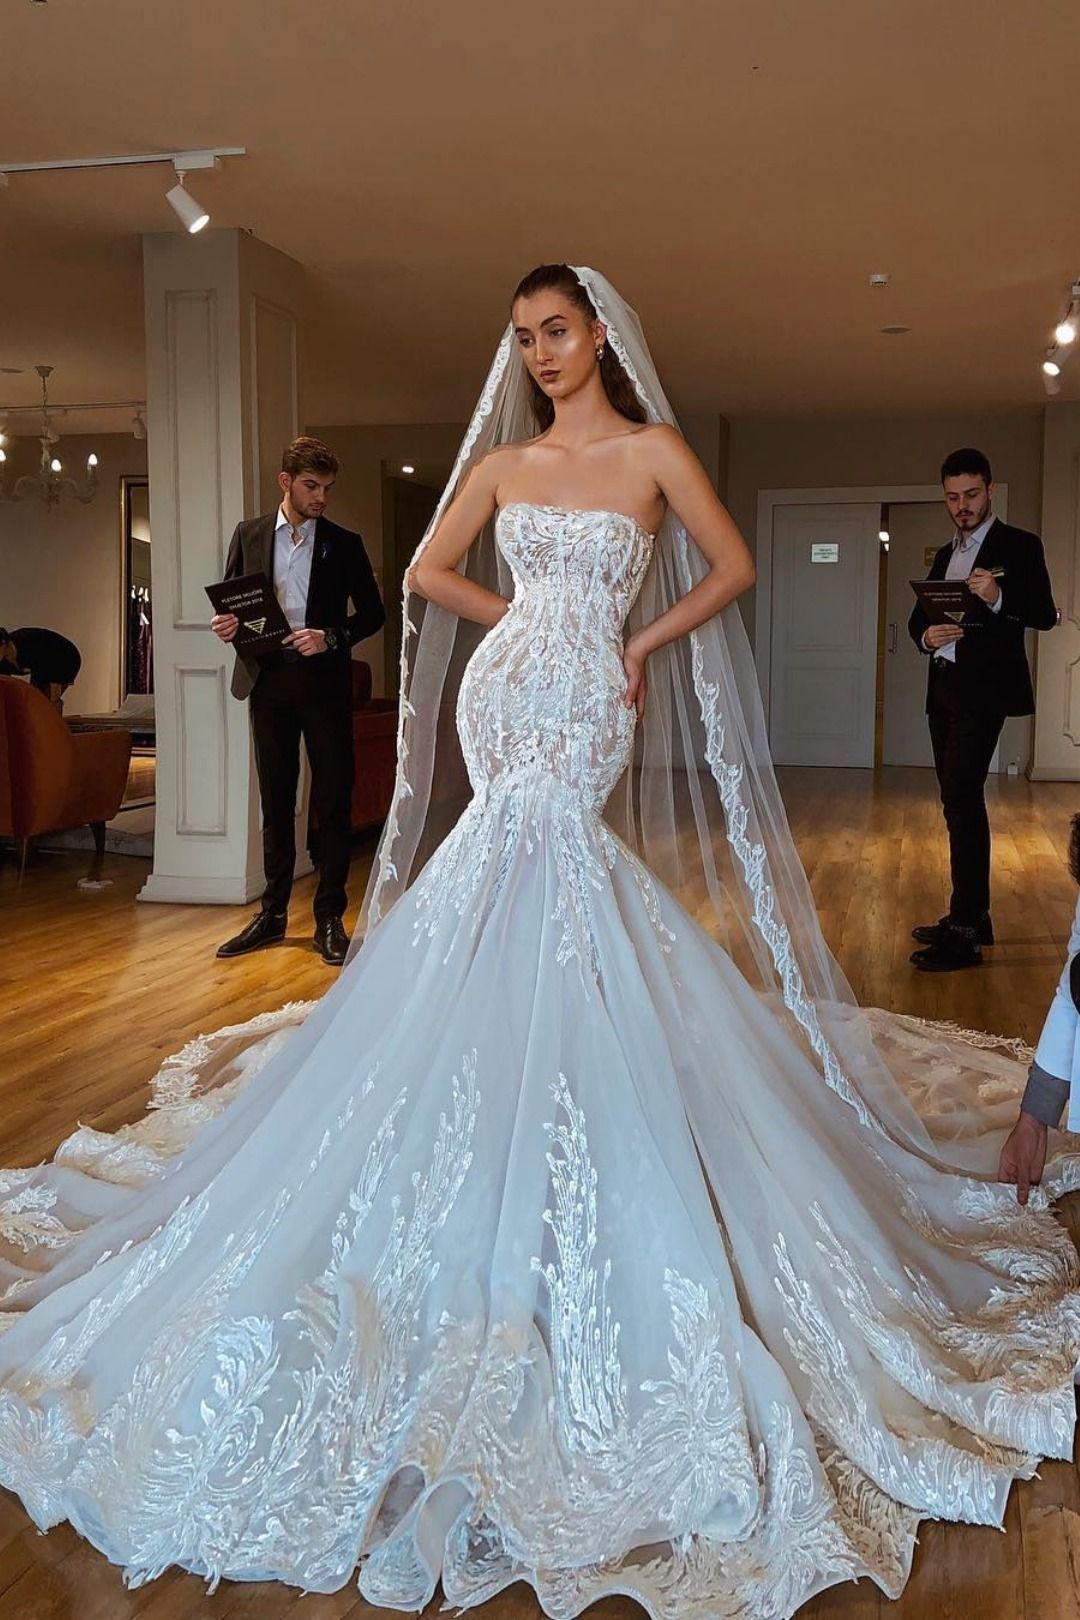 Valdrin Sahiti Bridal Gown Wedding Dress Necklines Long Train Wedding Dress Strapless Wedding Dress Mermaid [ 1620 x 1080 Pixel ]